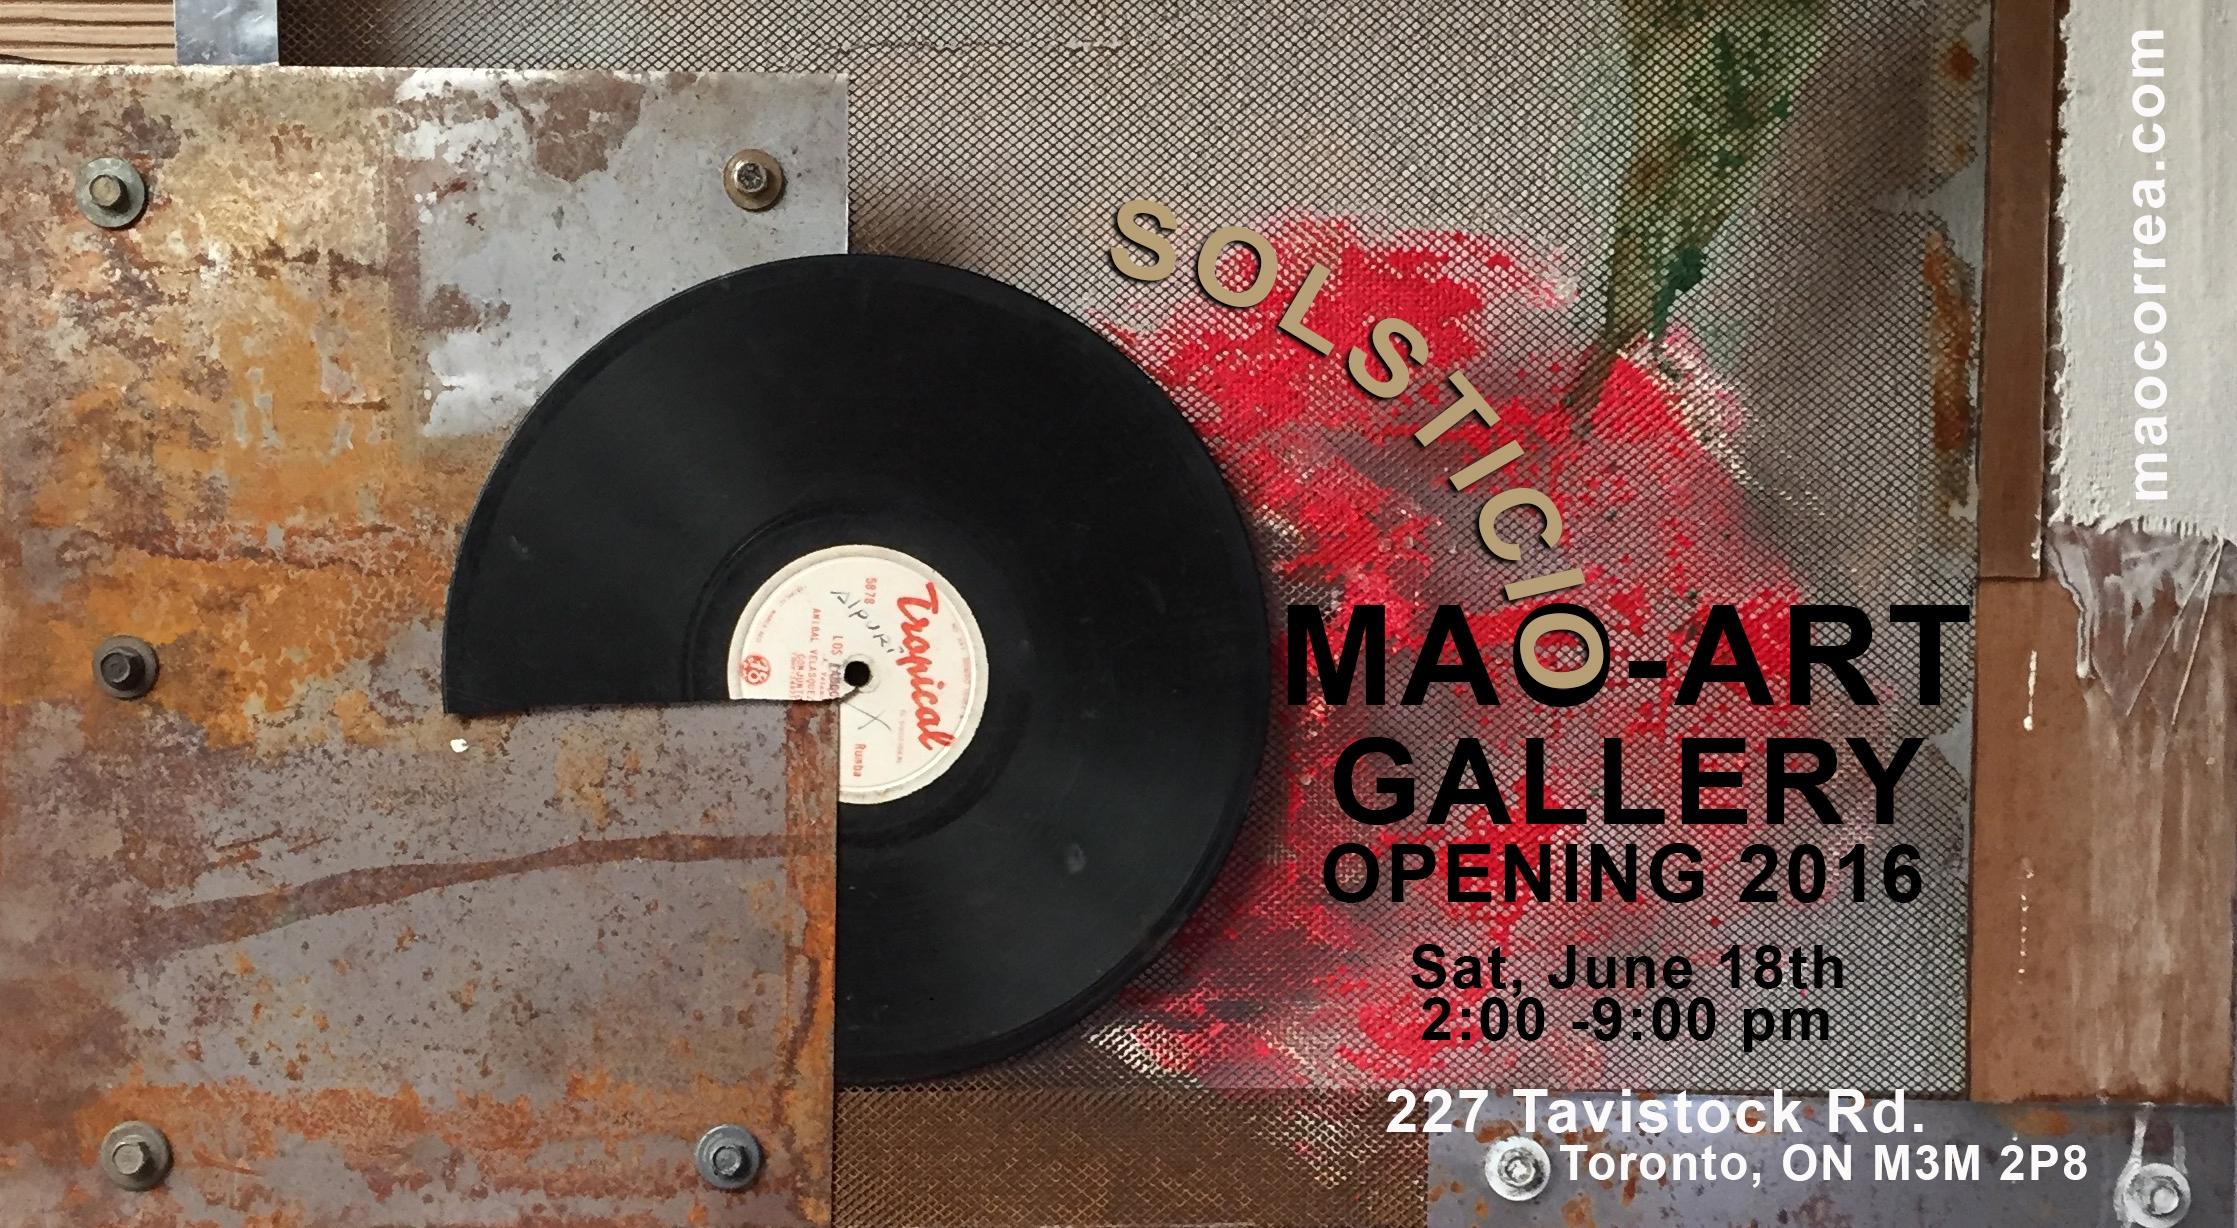 Toronto based artist Mao Correa opens Mao-Art Gallery: Solsticio 2016